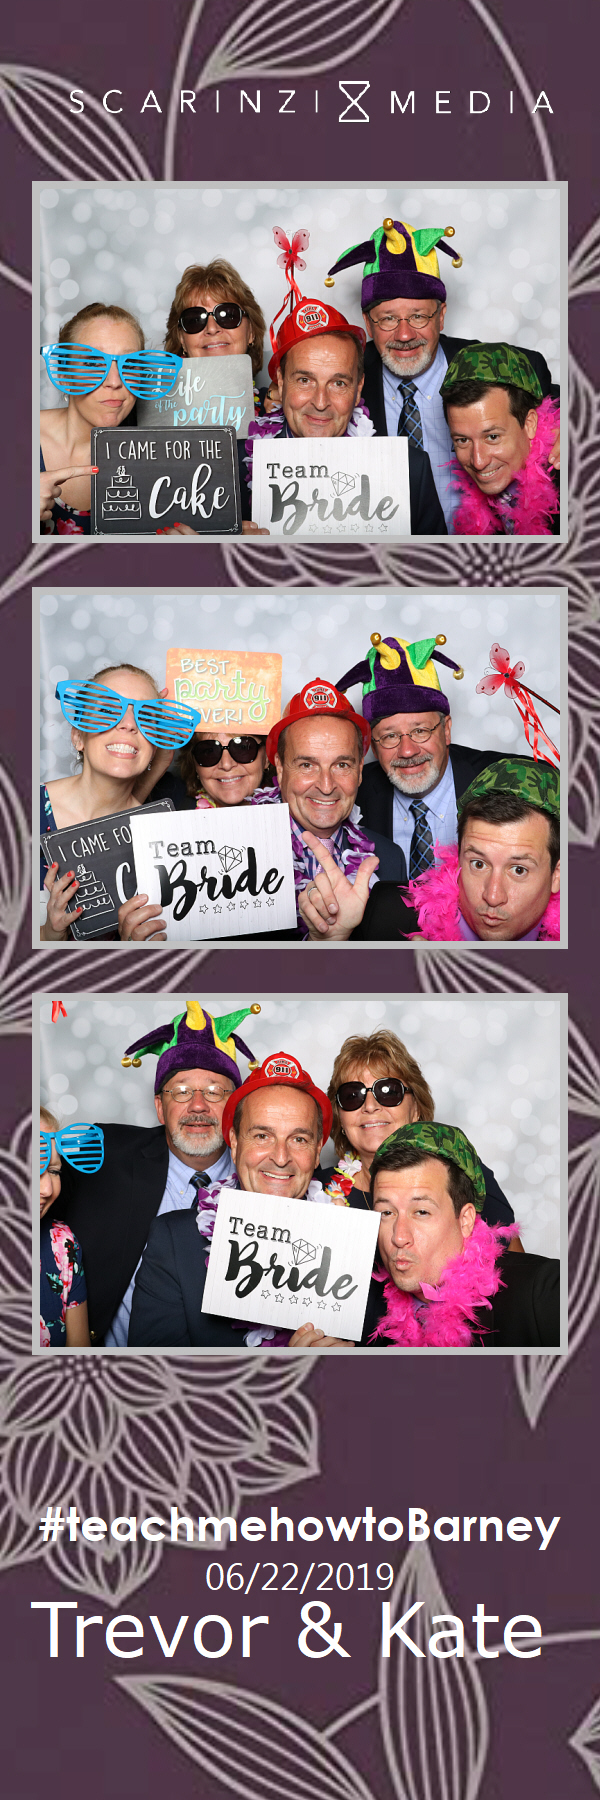 2019.06.22 - Barney Wedding PHOTOBOOTH21.jpg